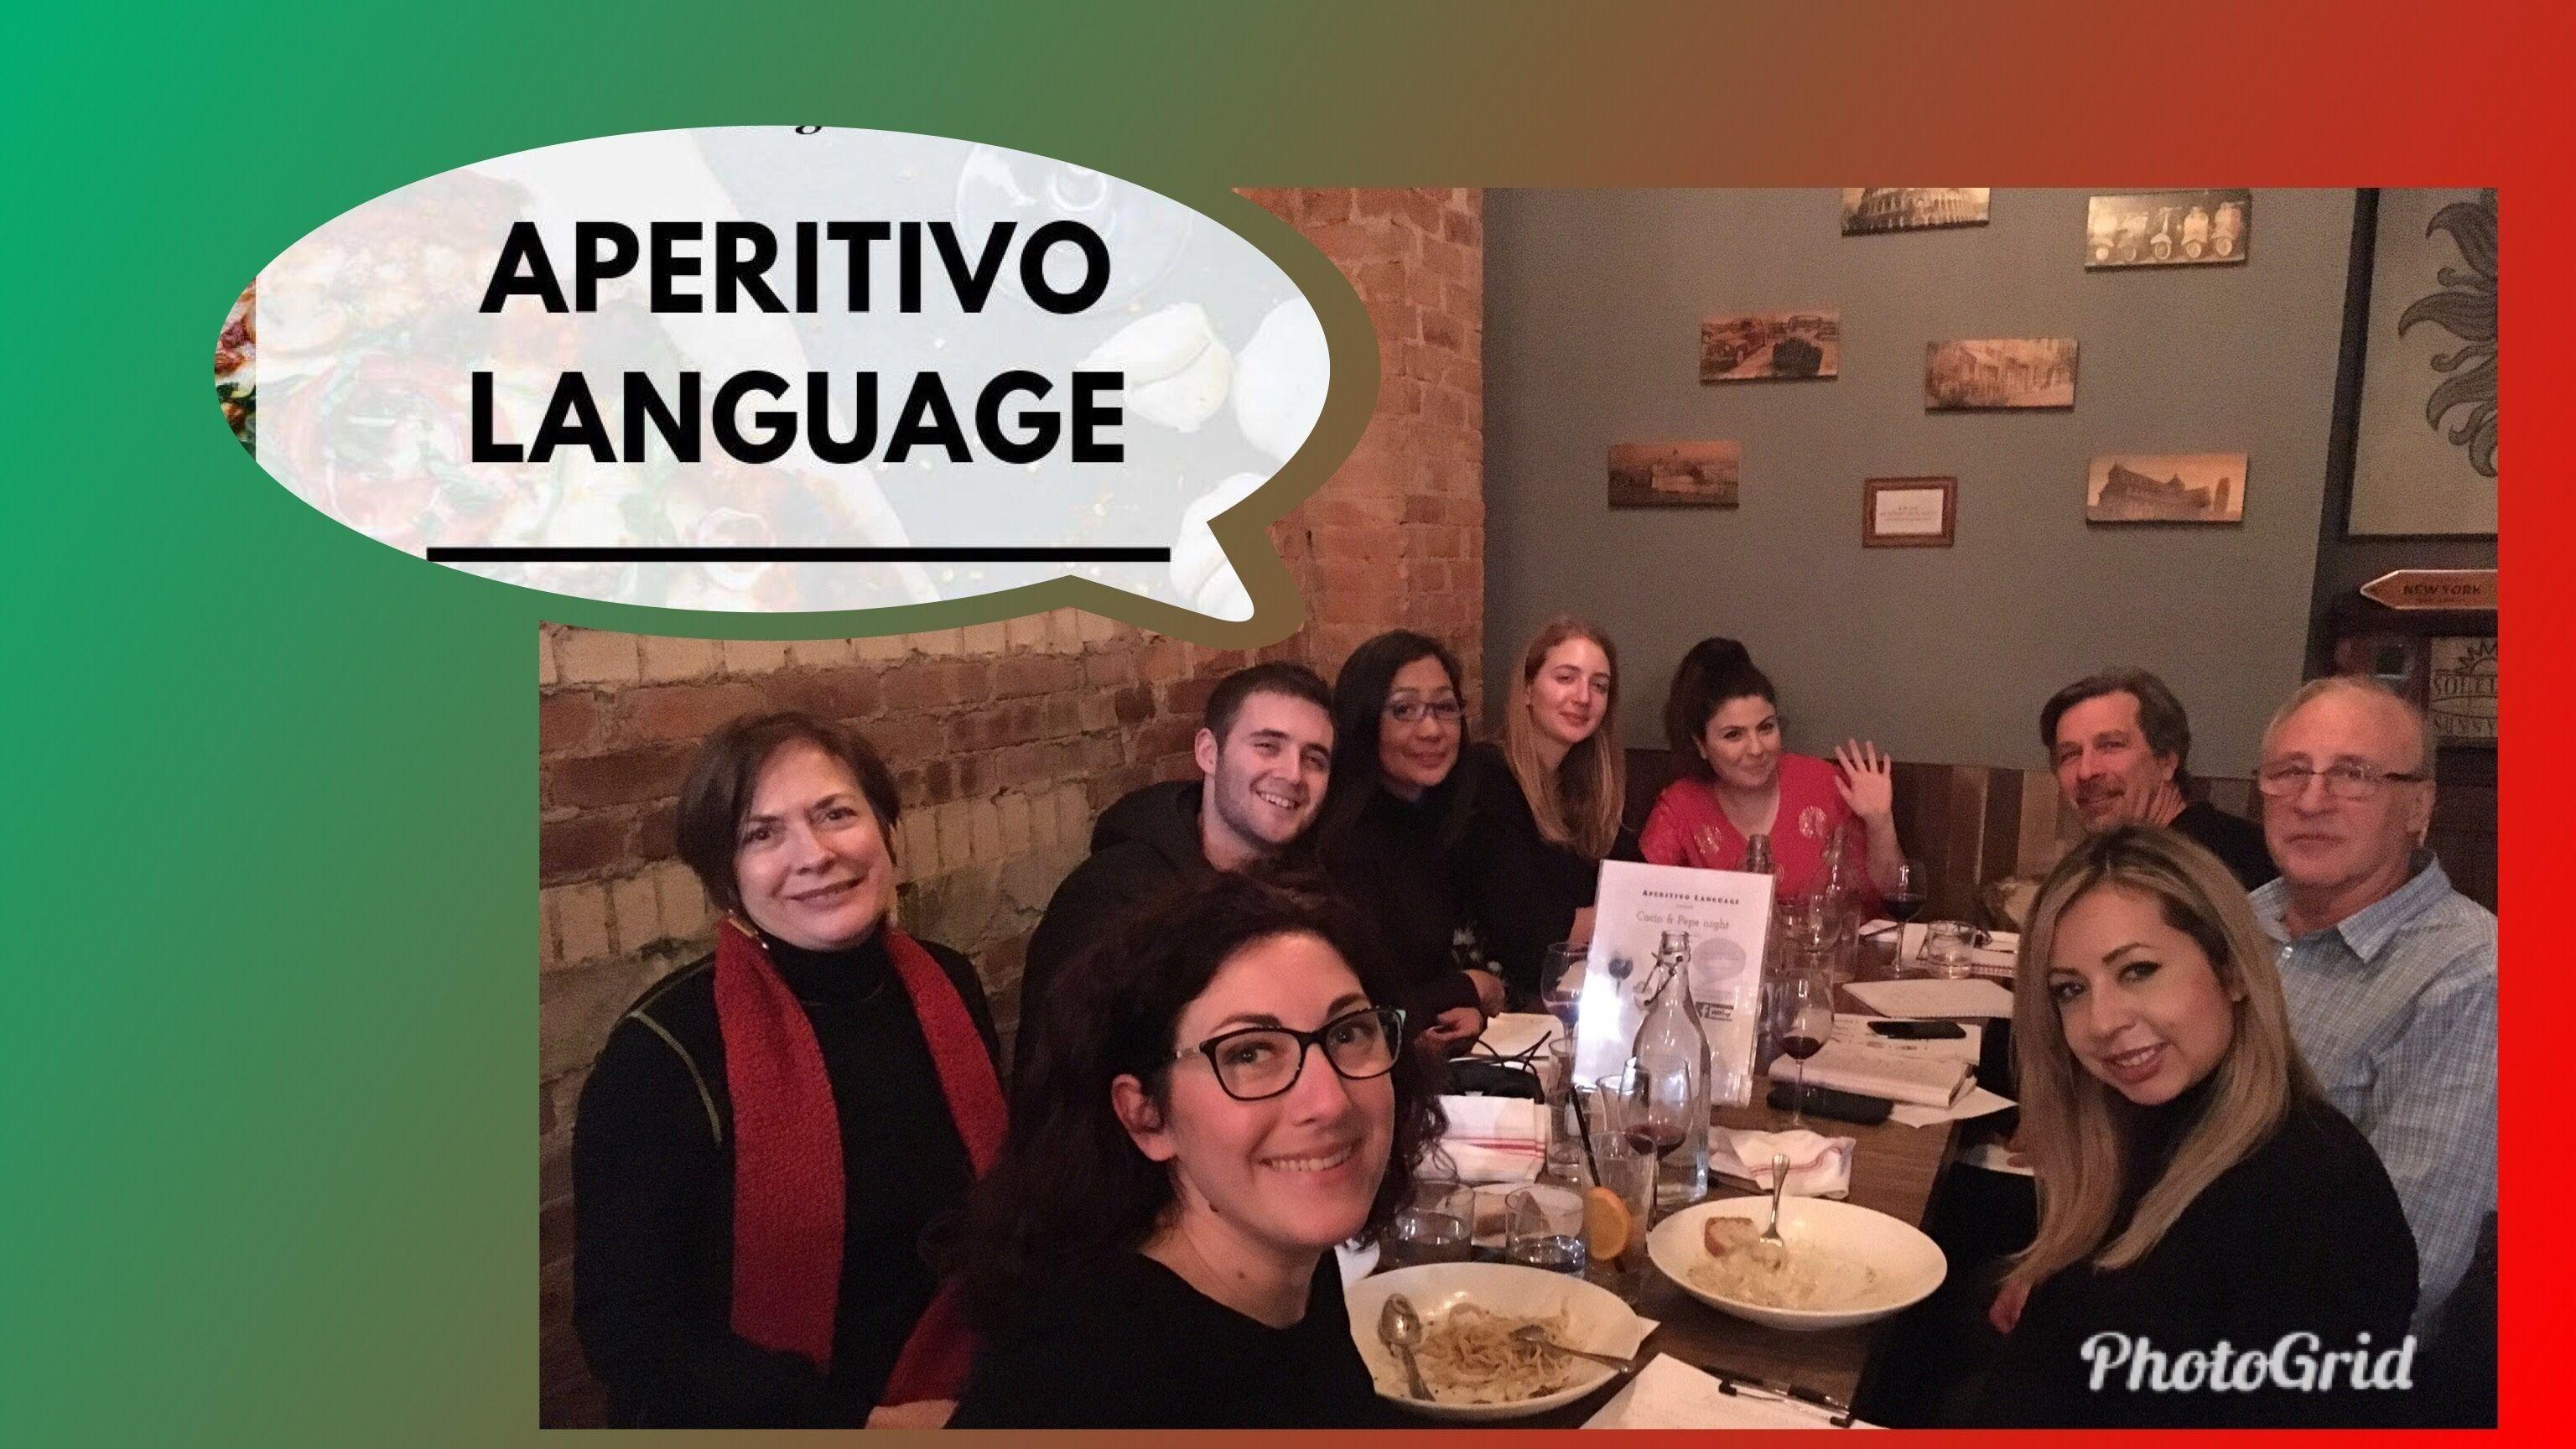 Aperitivo Language